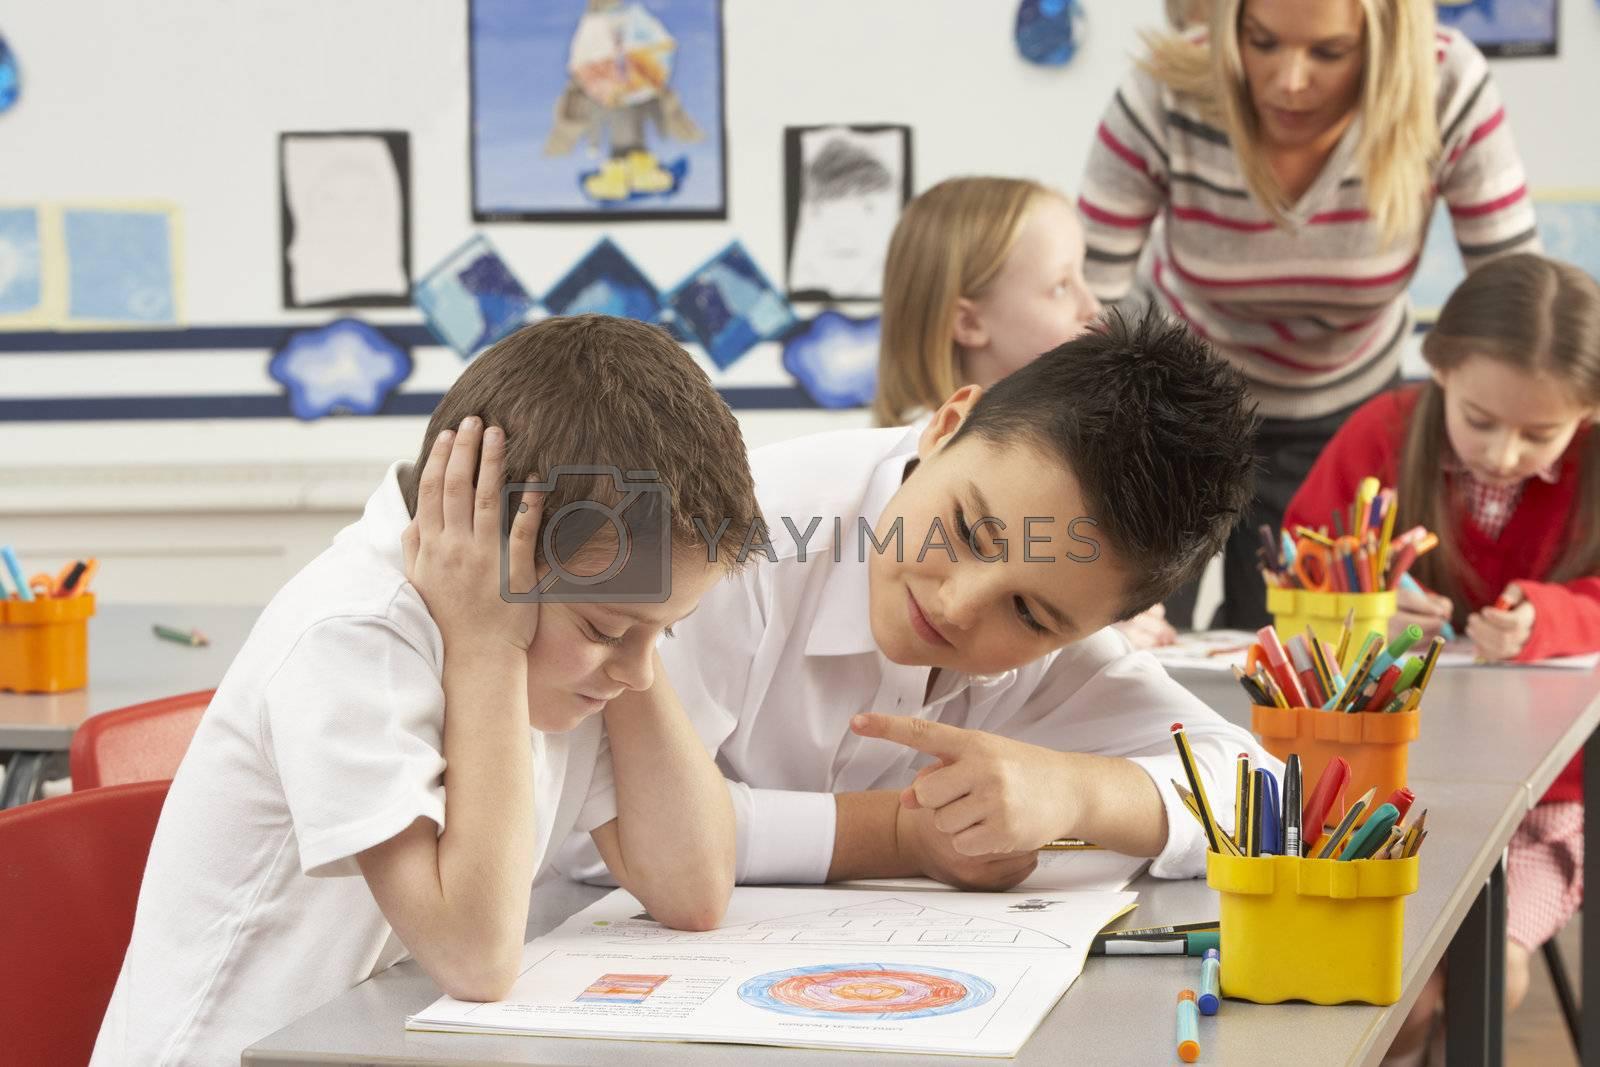 Group Of Primary Schoolchildren And Teacher Working At Desks In Classroom